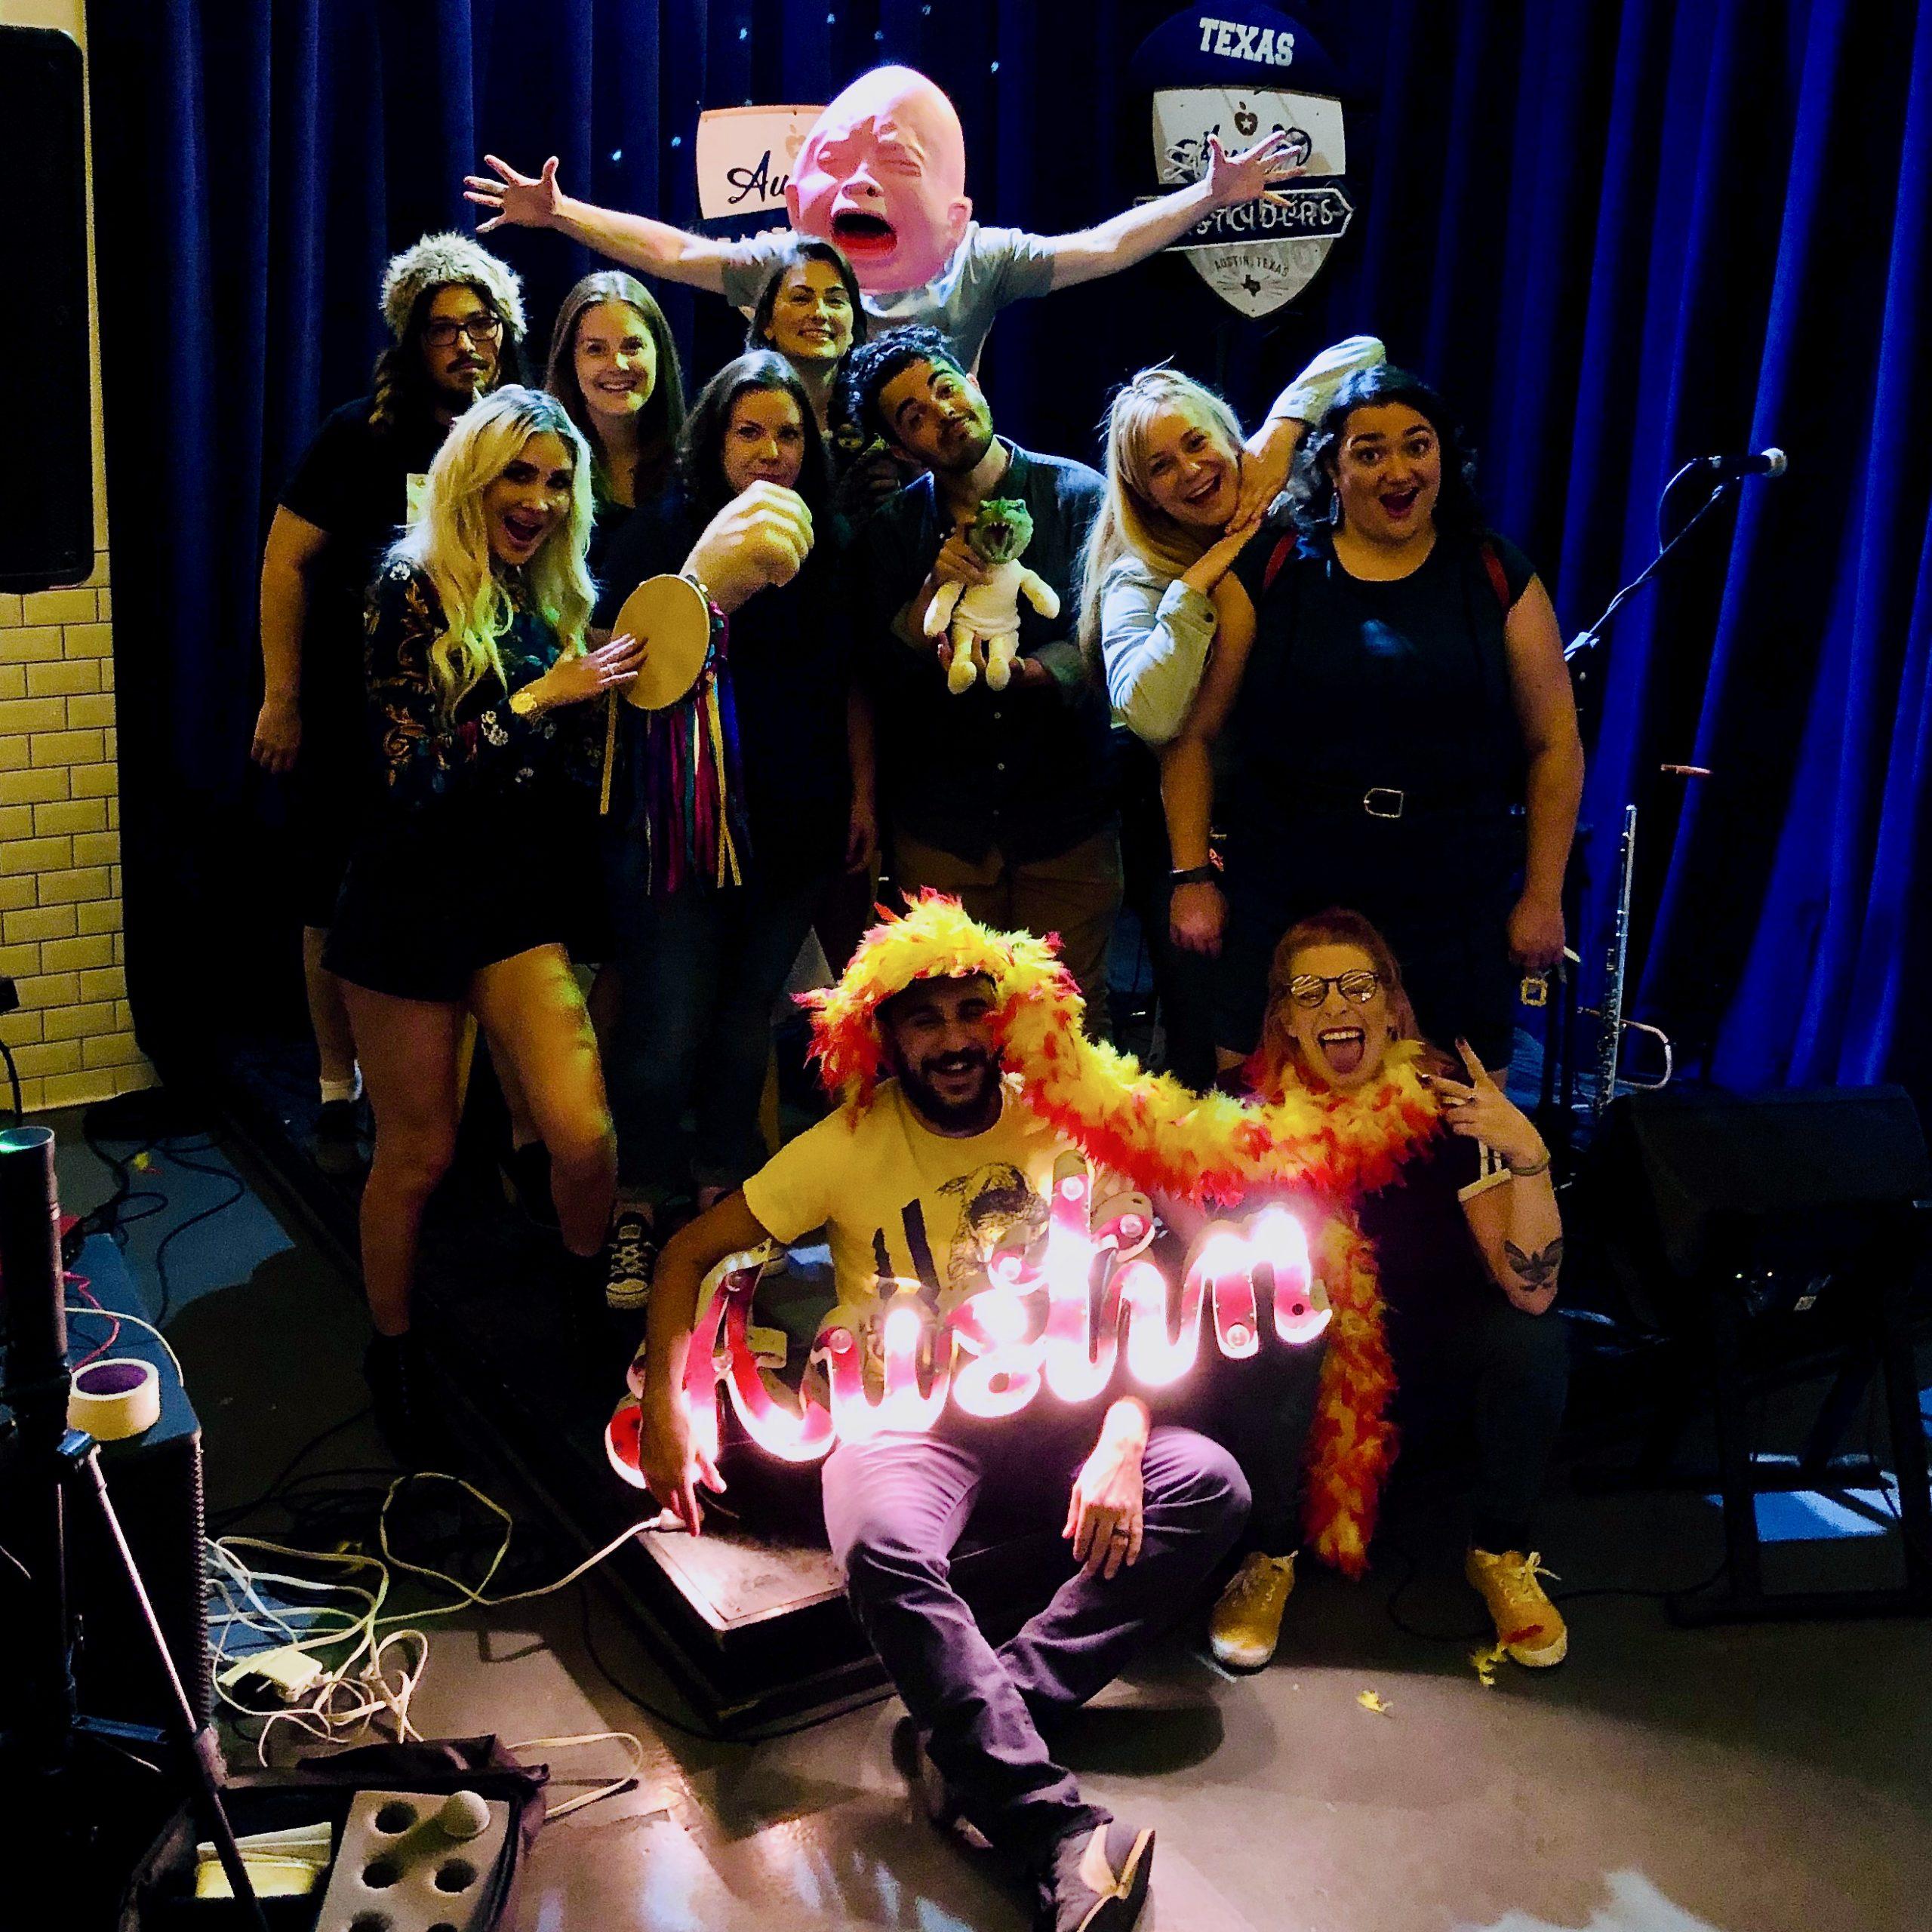 eBurner on Comedians Interviewing Musicians